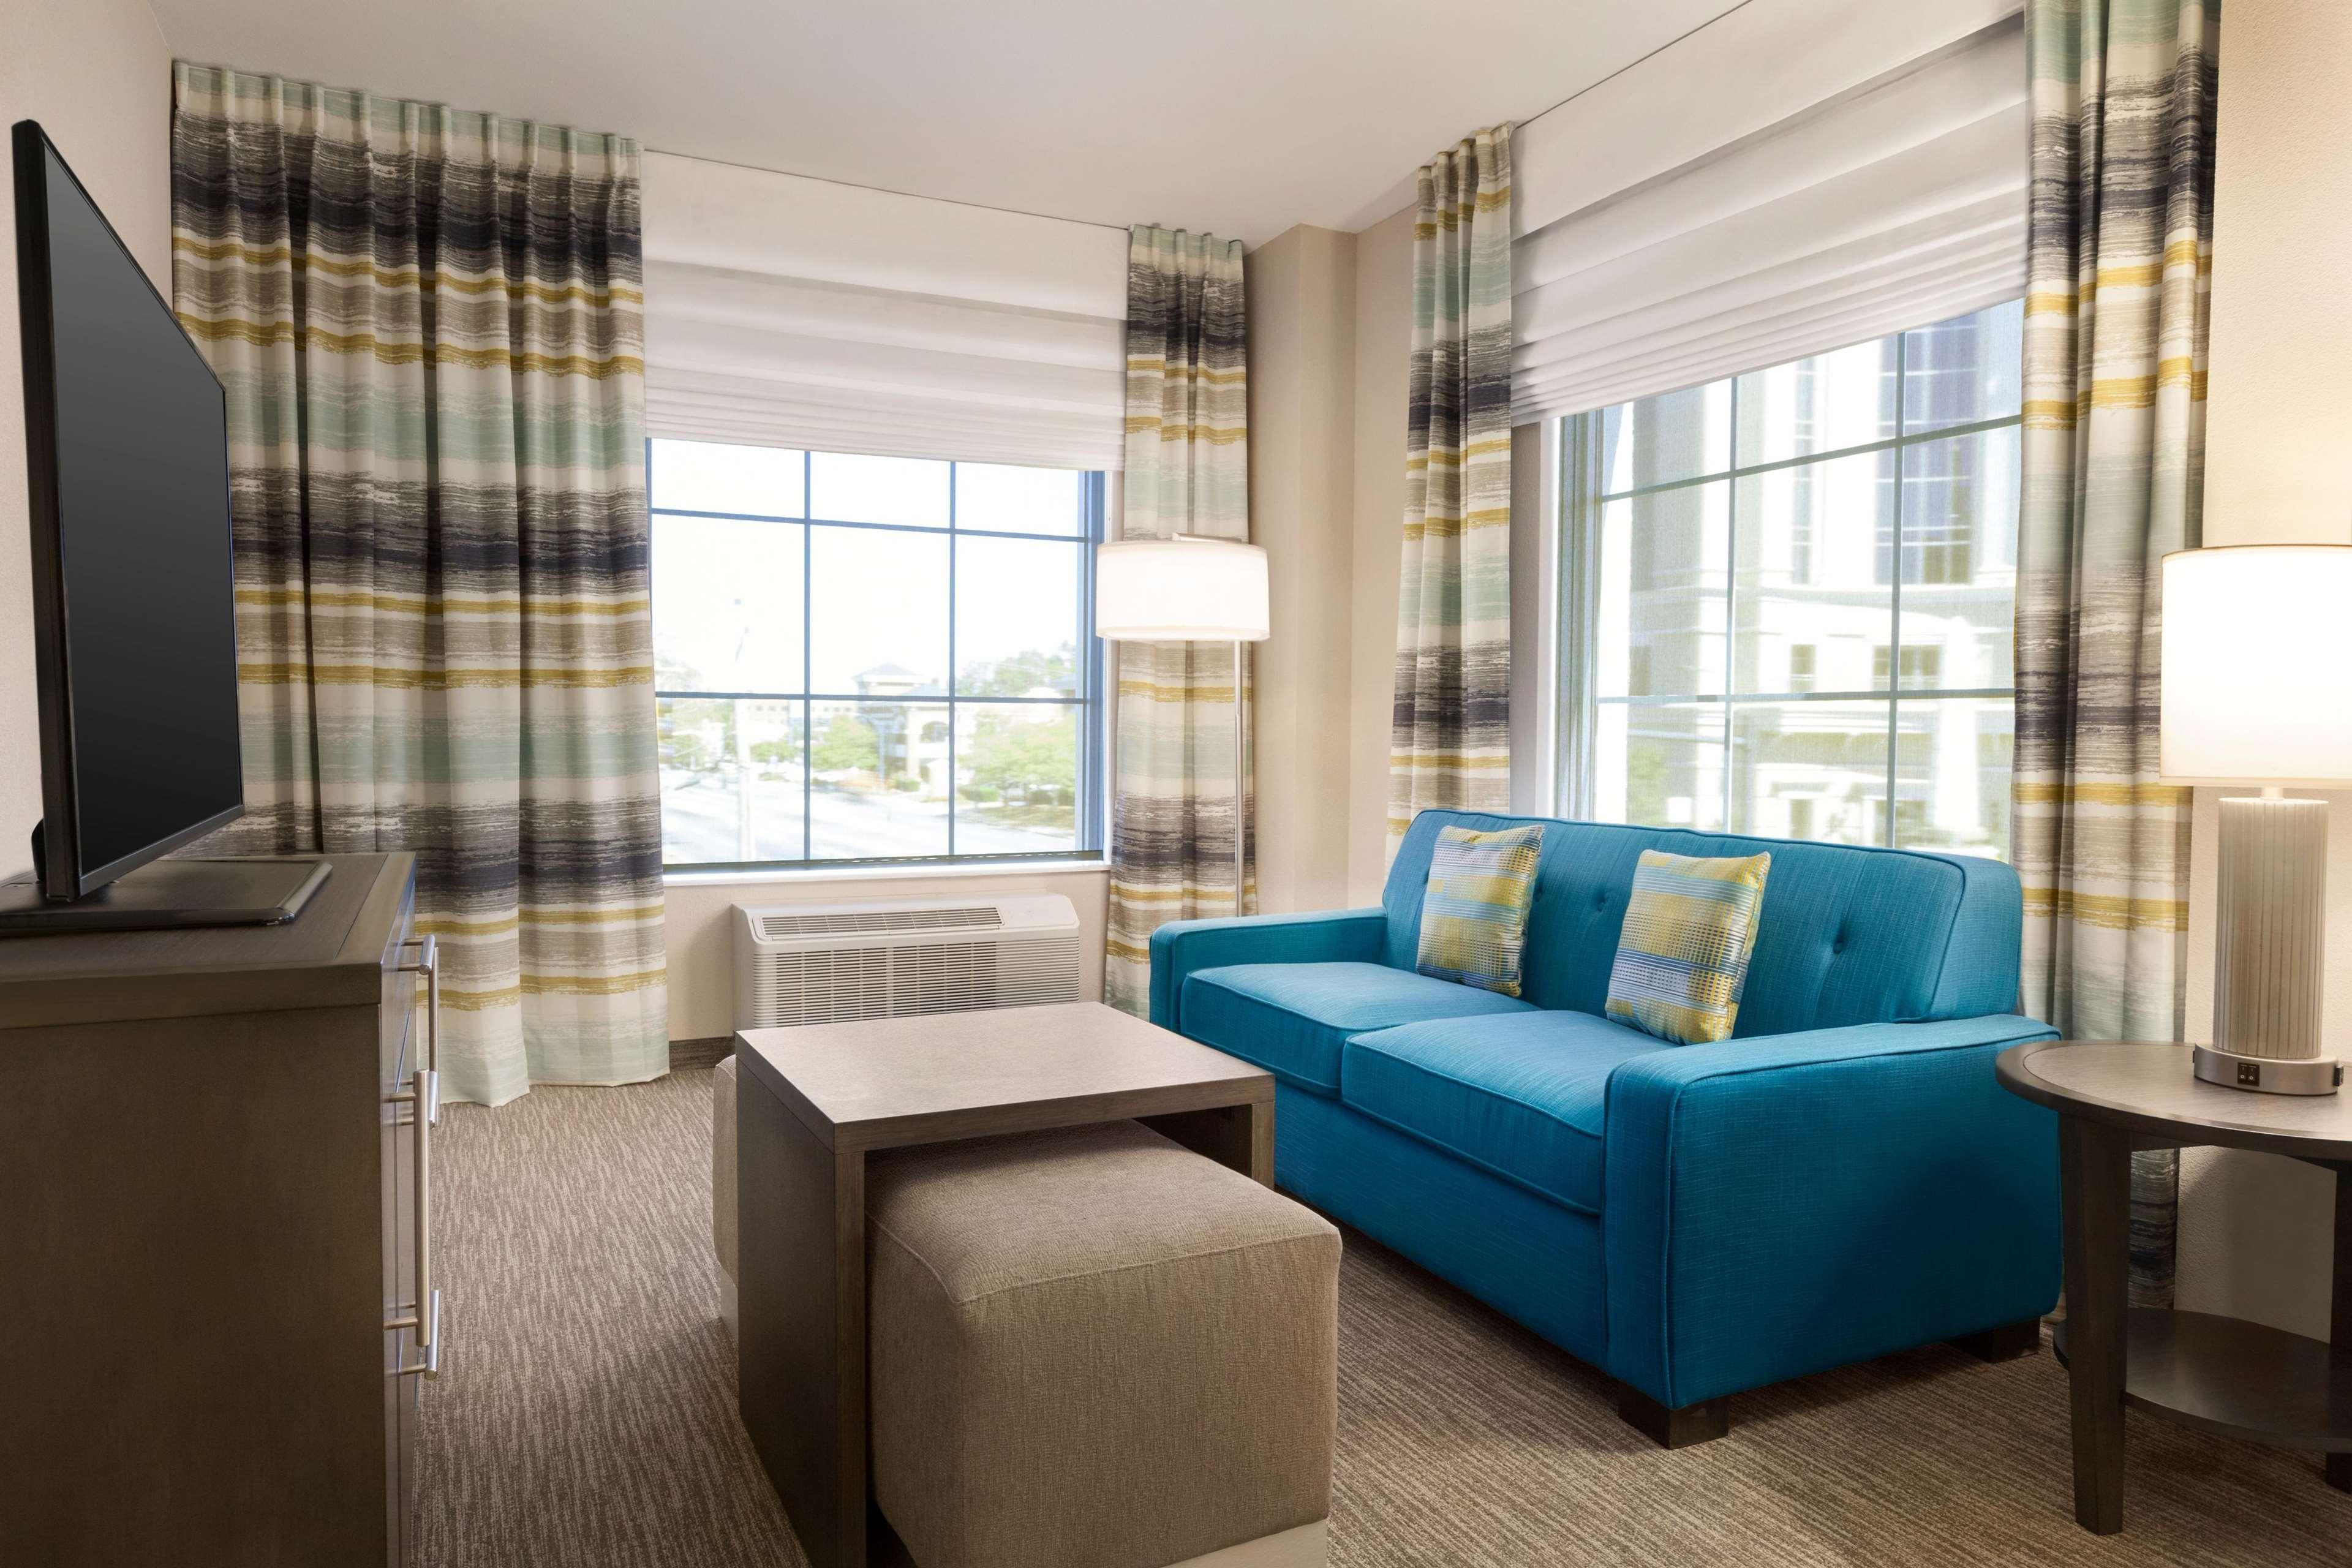 Homewood Suites by Hilton Charlotte/SouthPark image 29